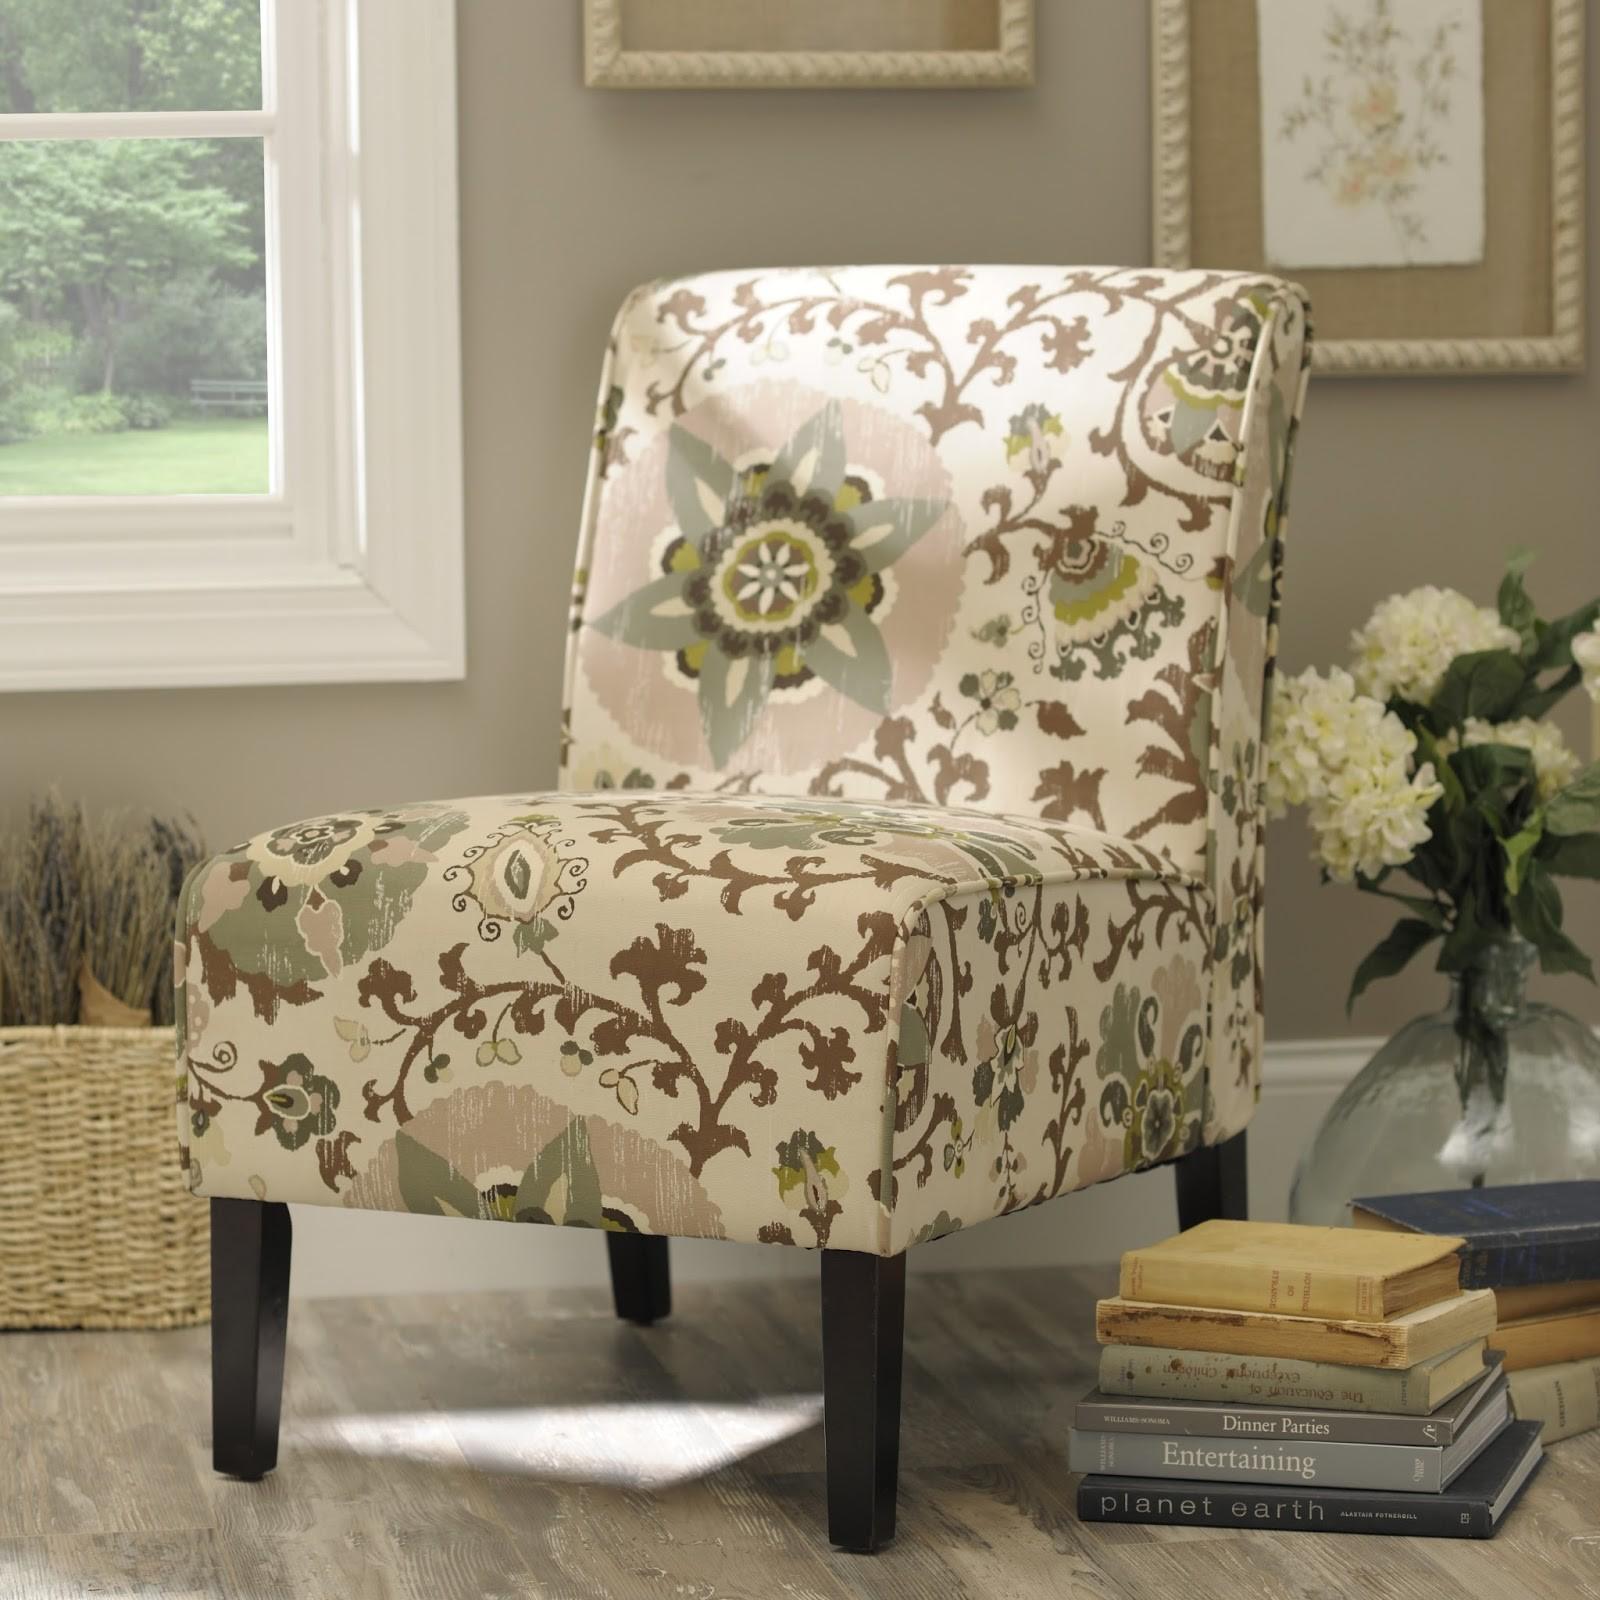 2 Furniture ideas Kirkland home decor by Simphome 6